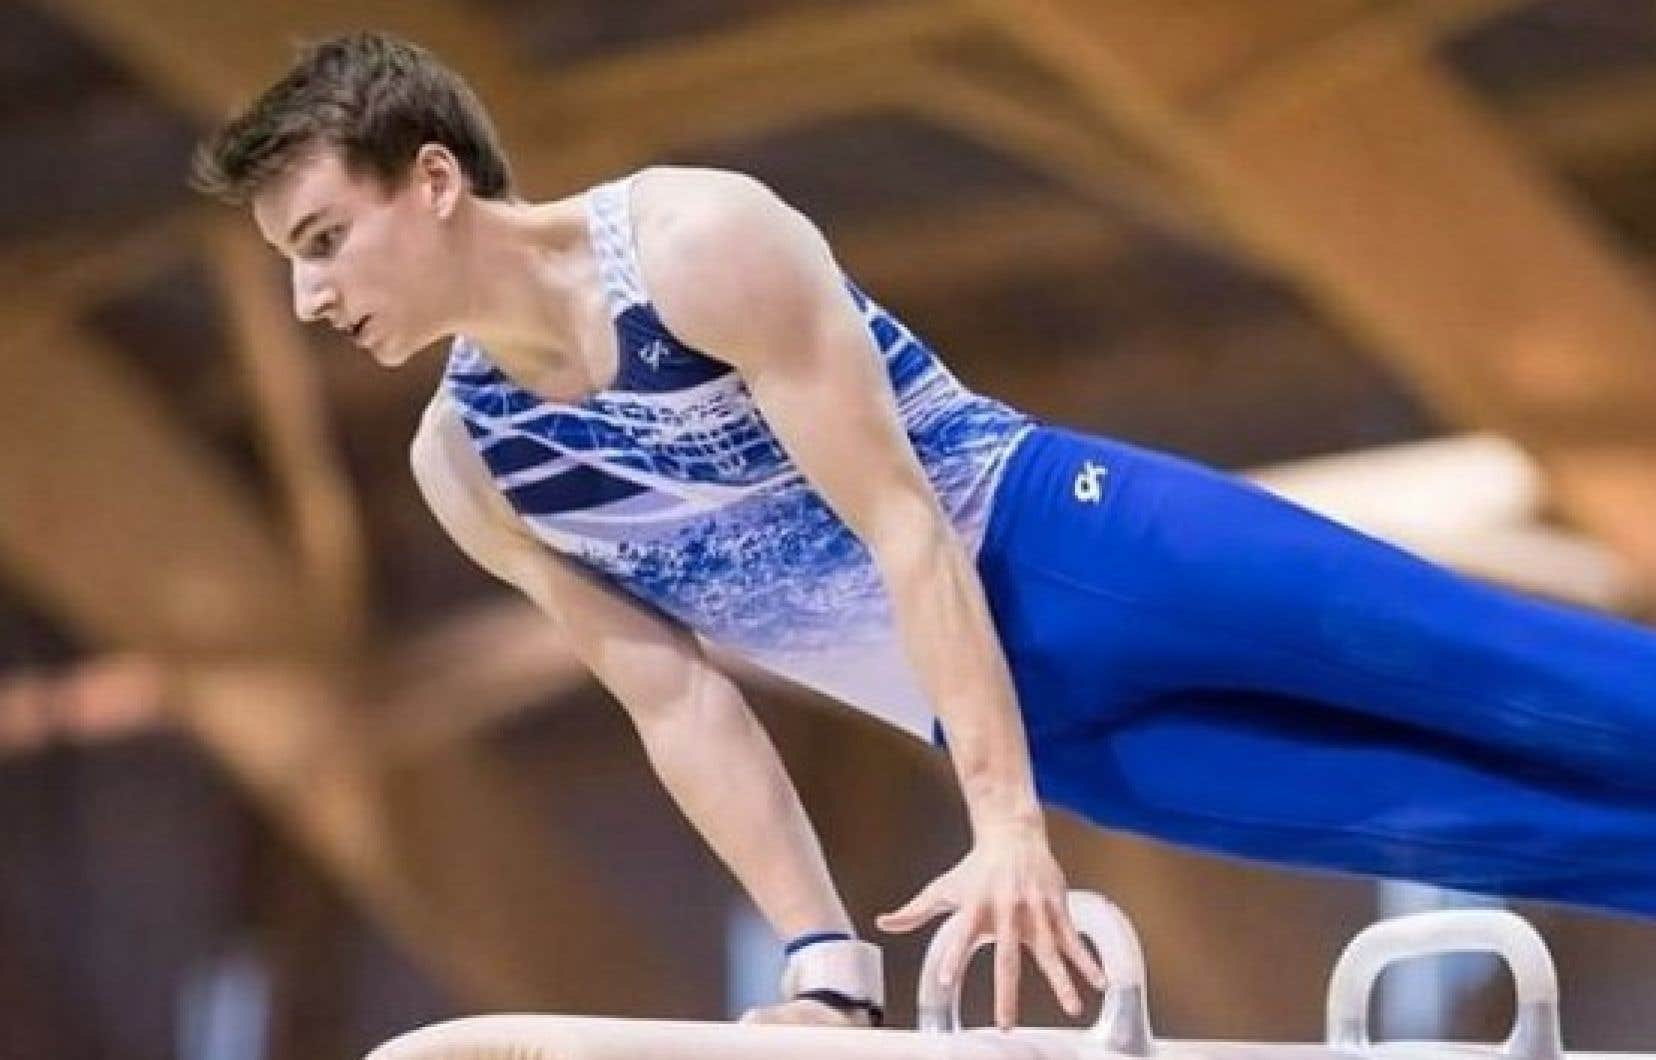 Le gymnaste québécois Thierry Pellerin